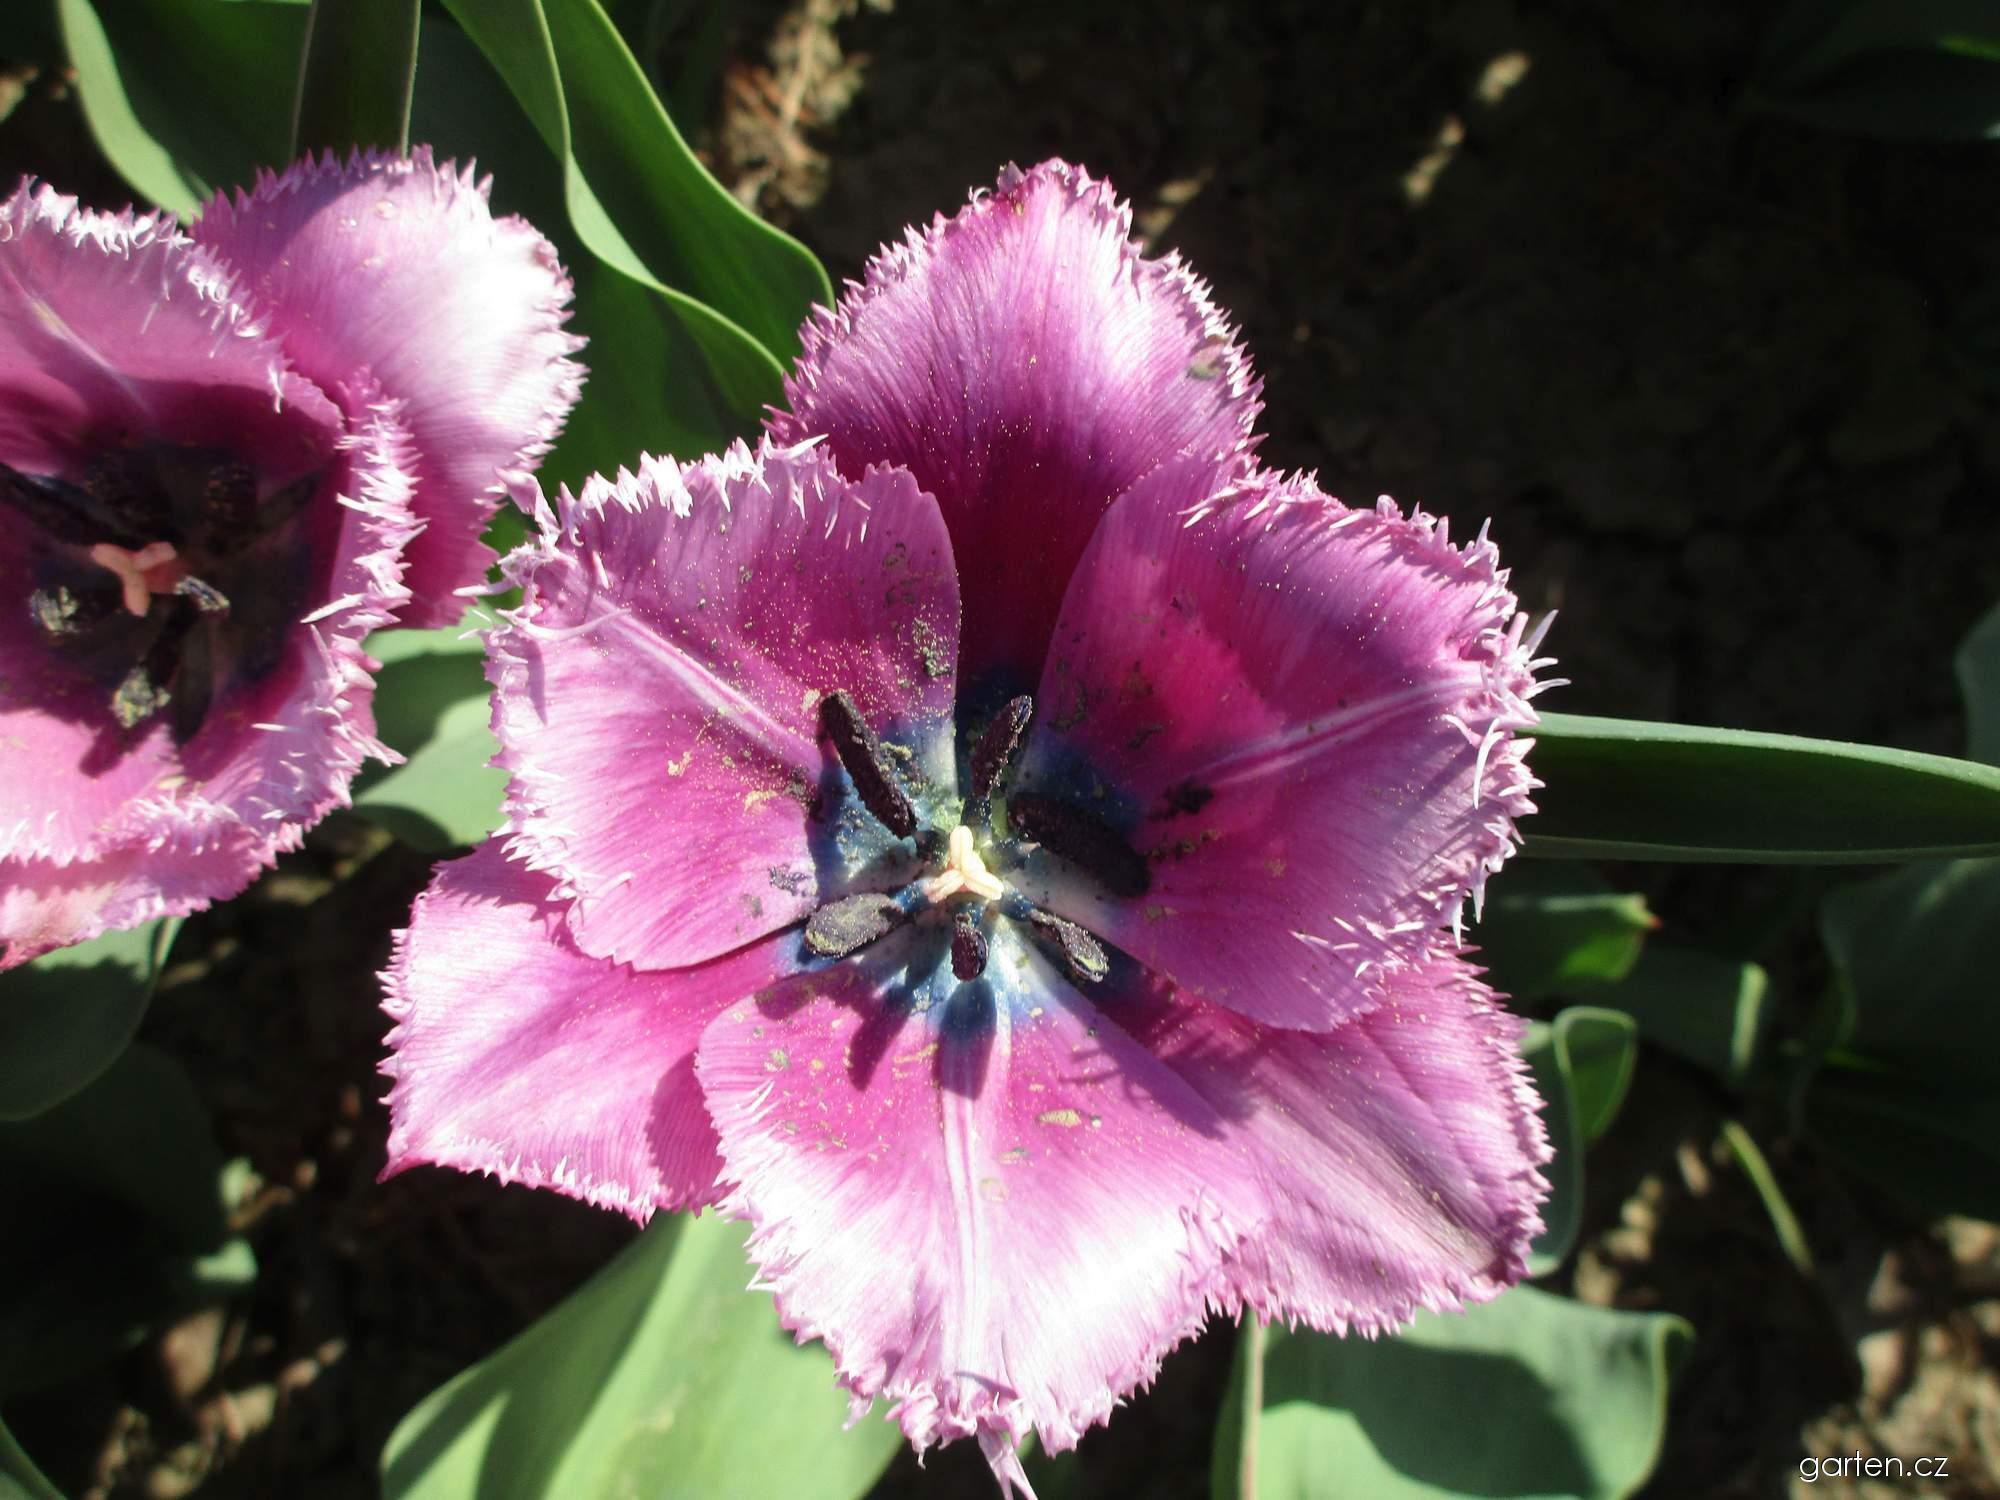 Tulipán Louvre (Tulipa x hybrida)